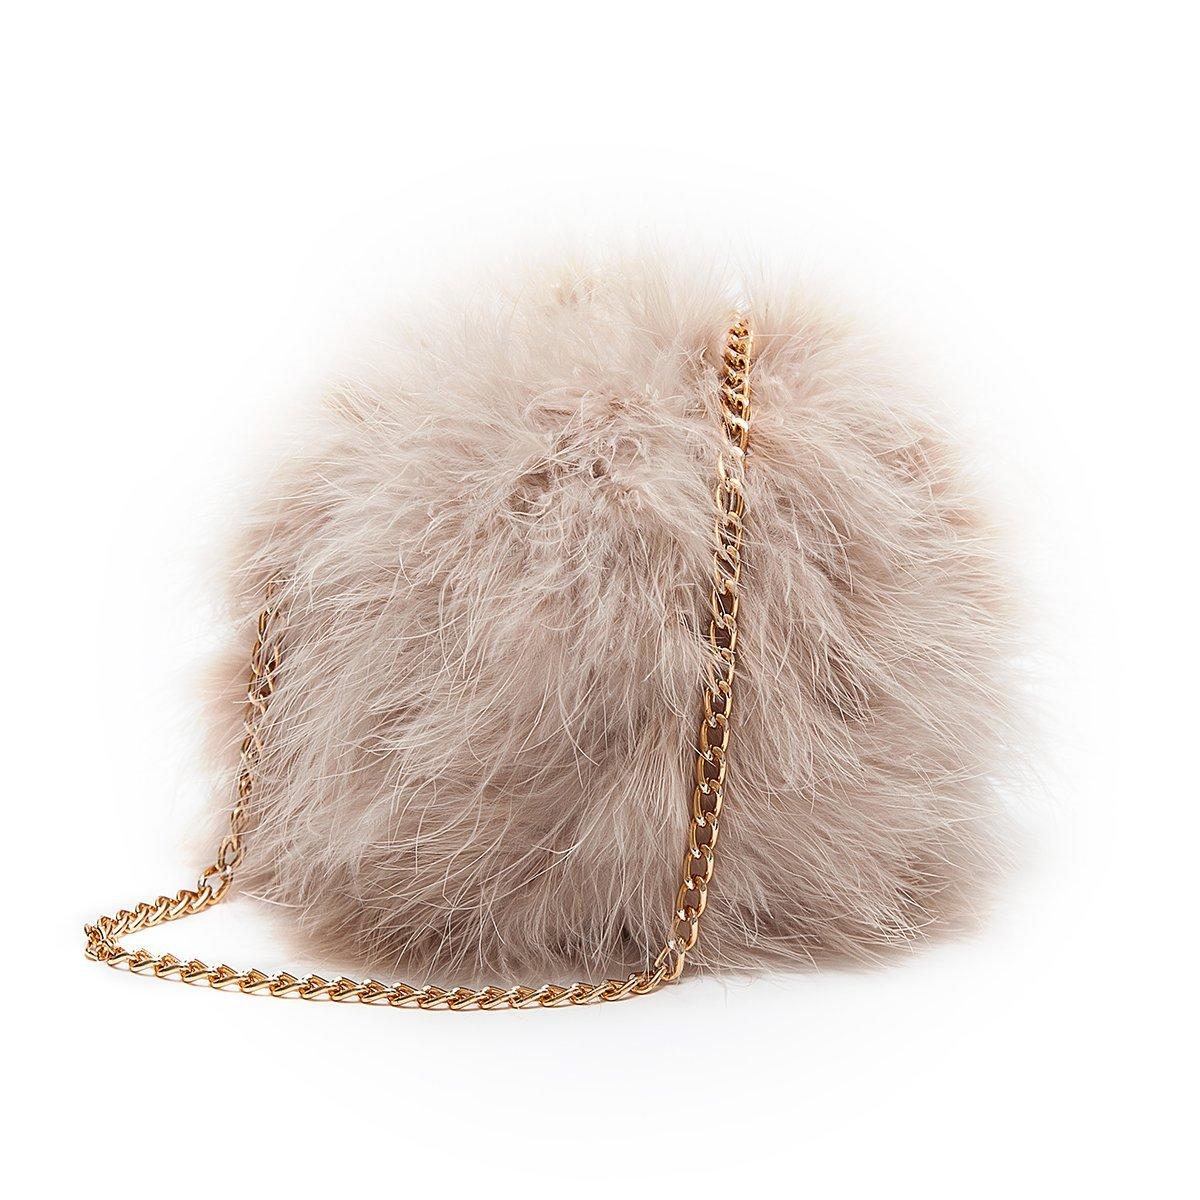 3ca8fc44c88c Flada Women s Faux Fluffy Feather Round Clutch Shoulder Bag Apricot   Handbags  Amazon.com